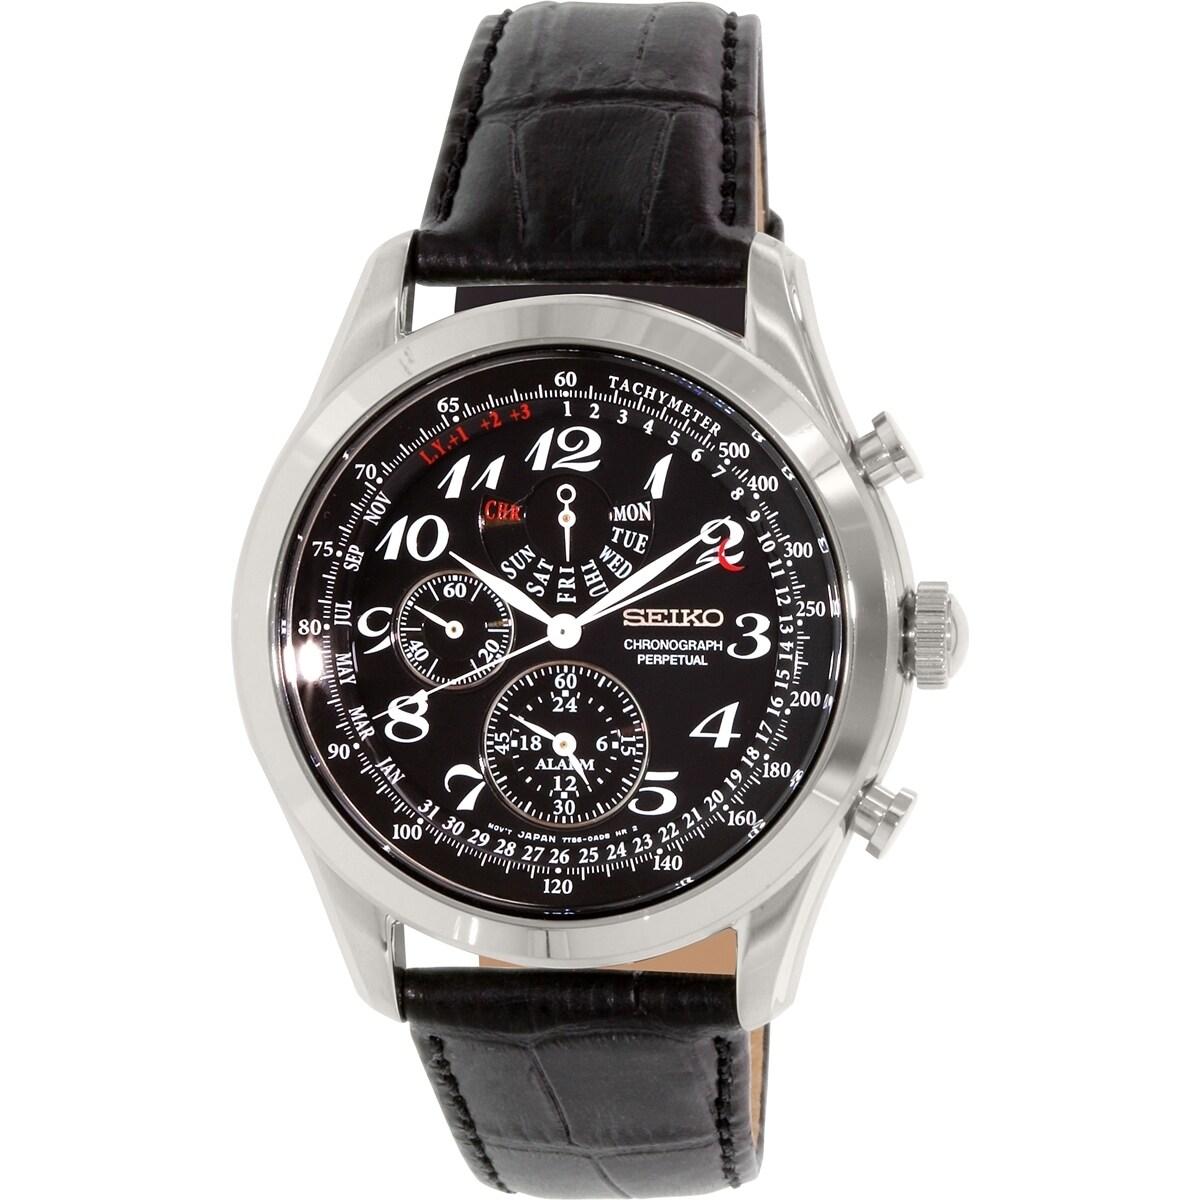 Seiko Men's SPC133 Black Leather Quartz Watch (SPC133), P...